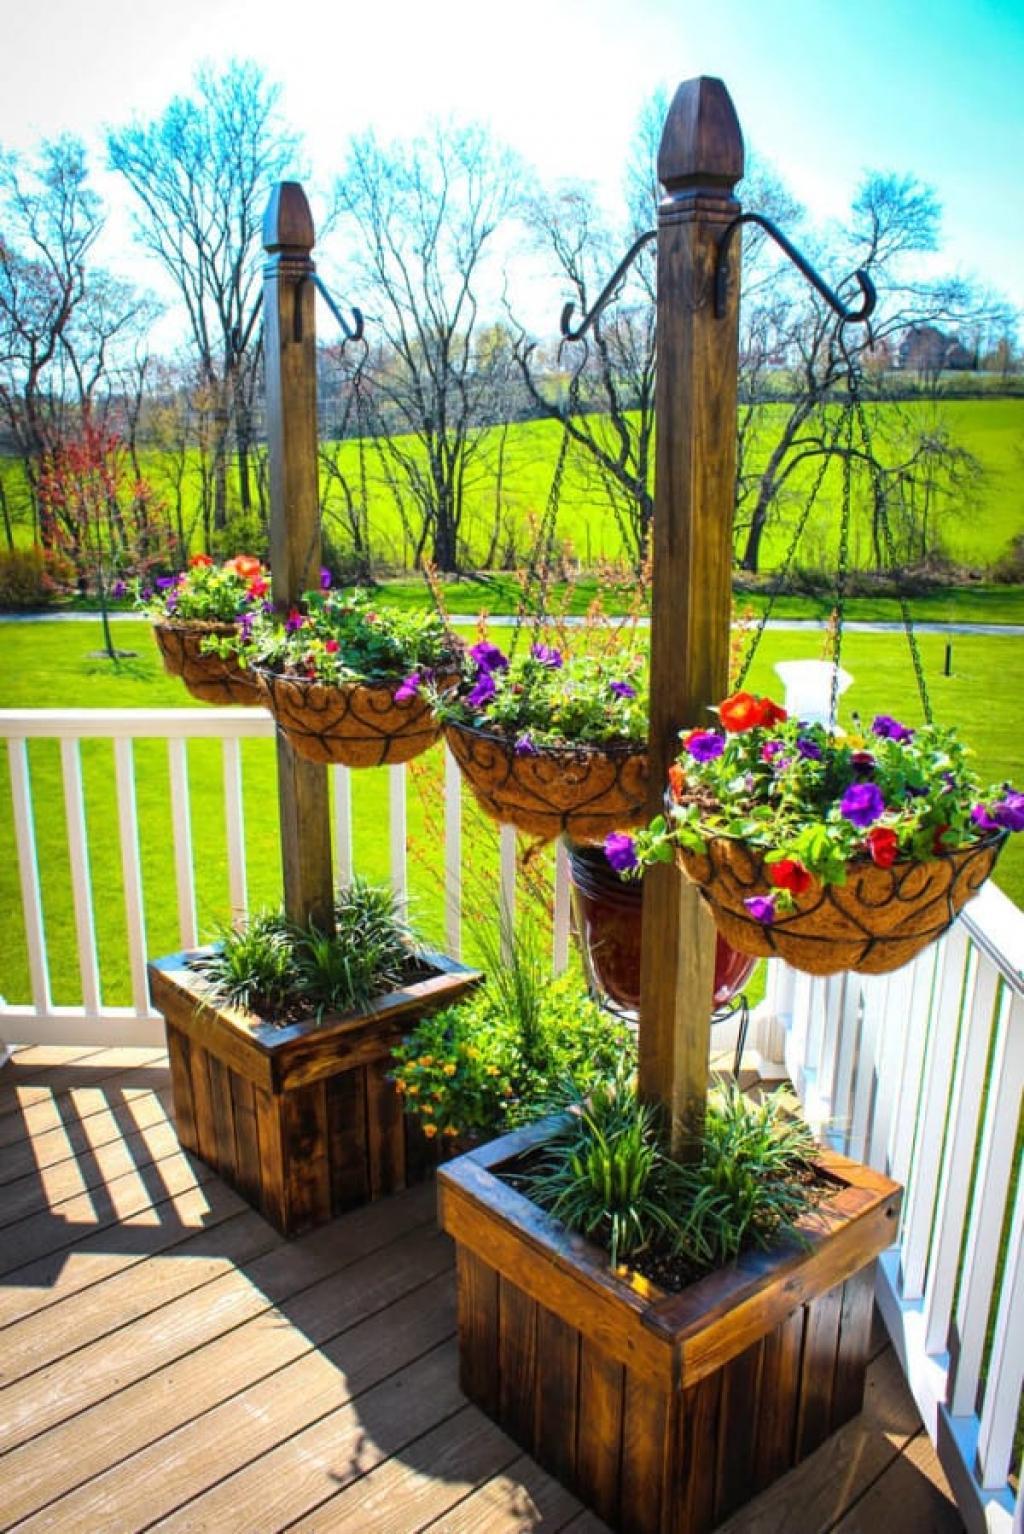 Backyard Landscape: 16 Amazing DIY Patio Decoration Ideas ... on Diy Small Patio Ideas id=78979